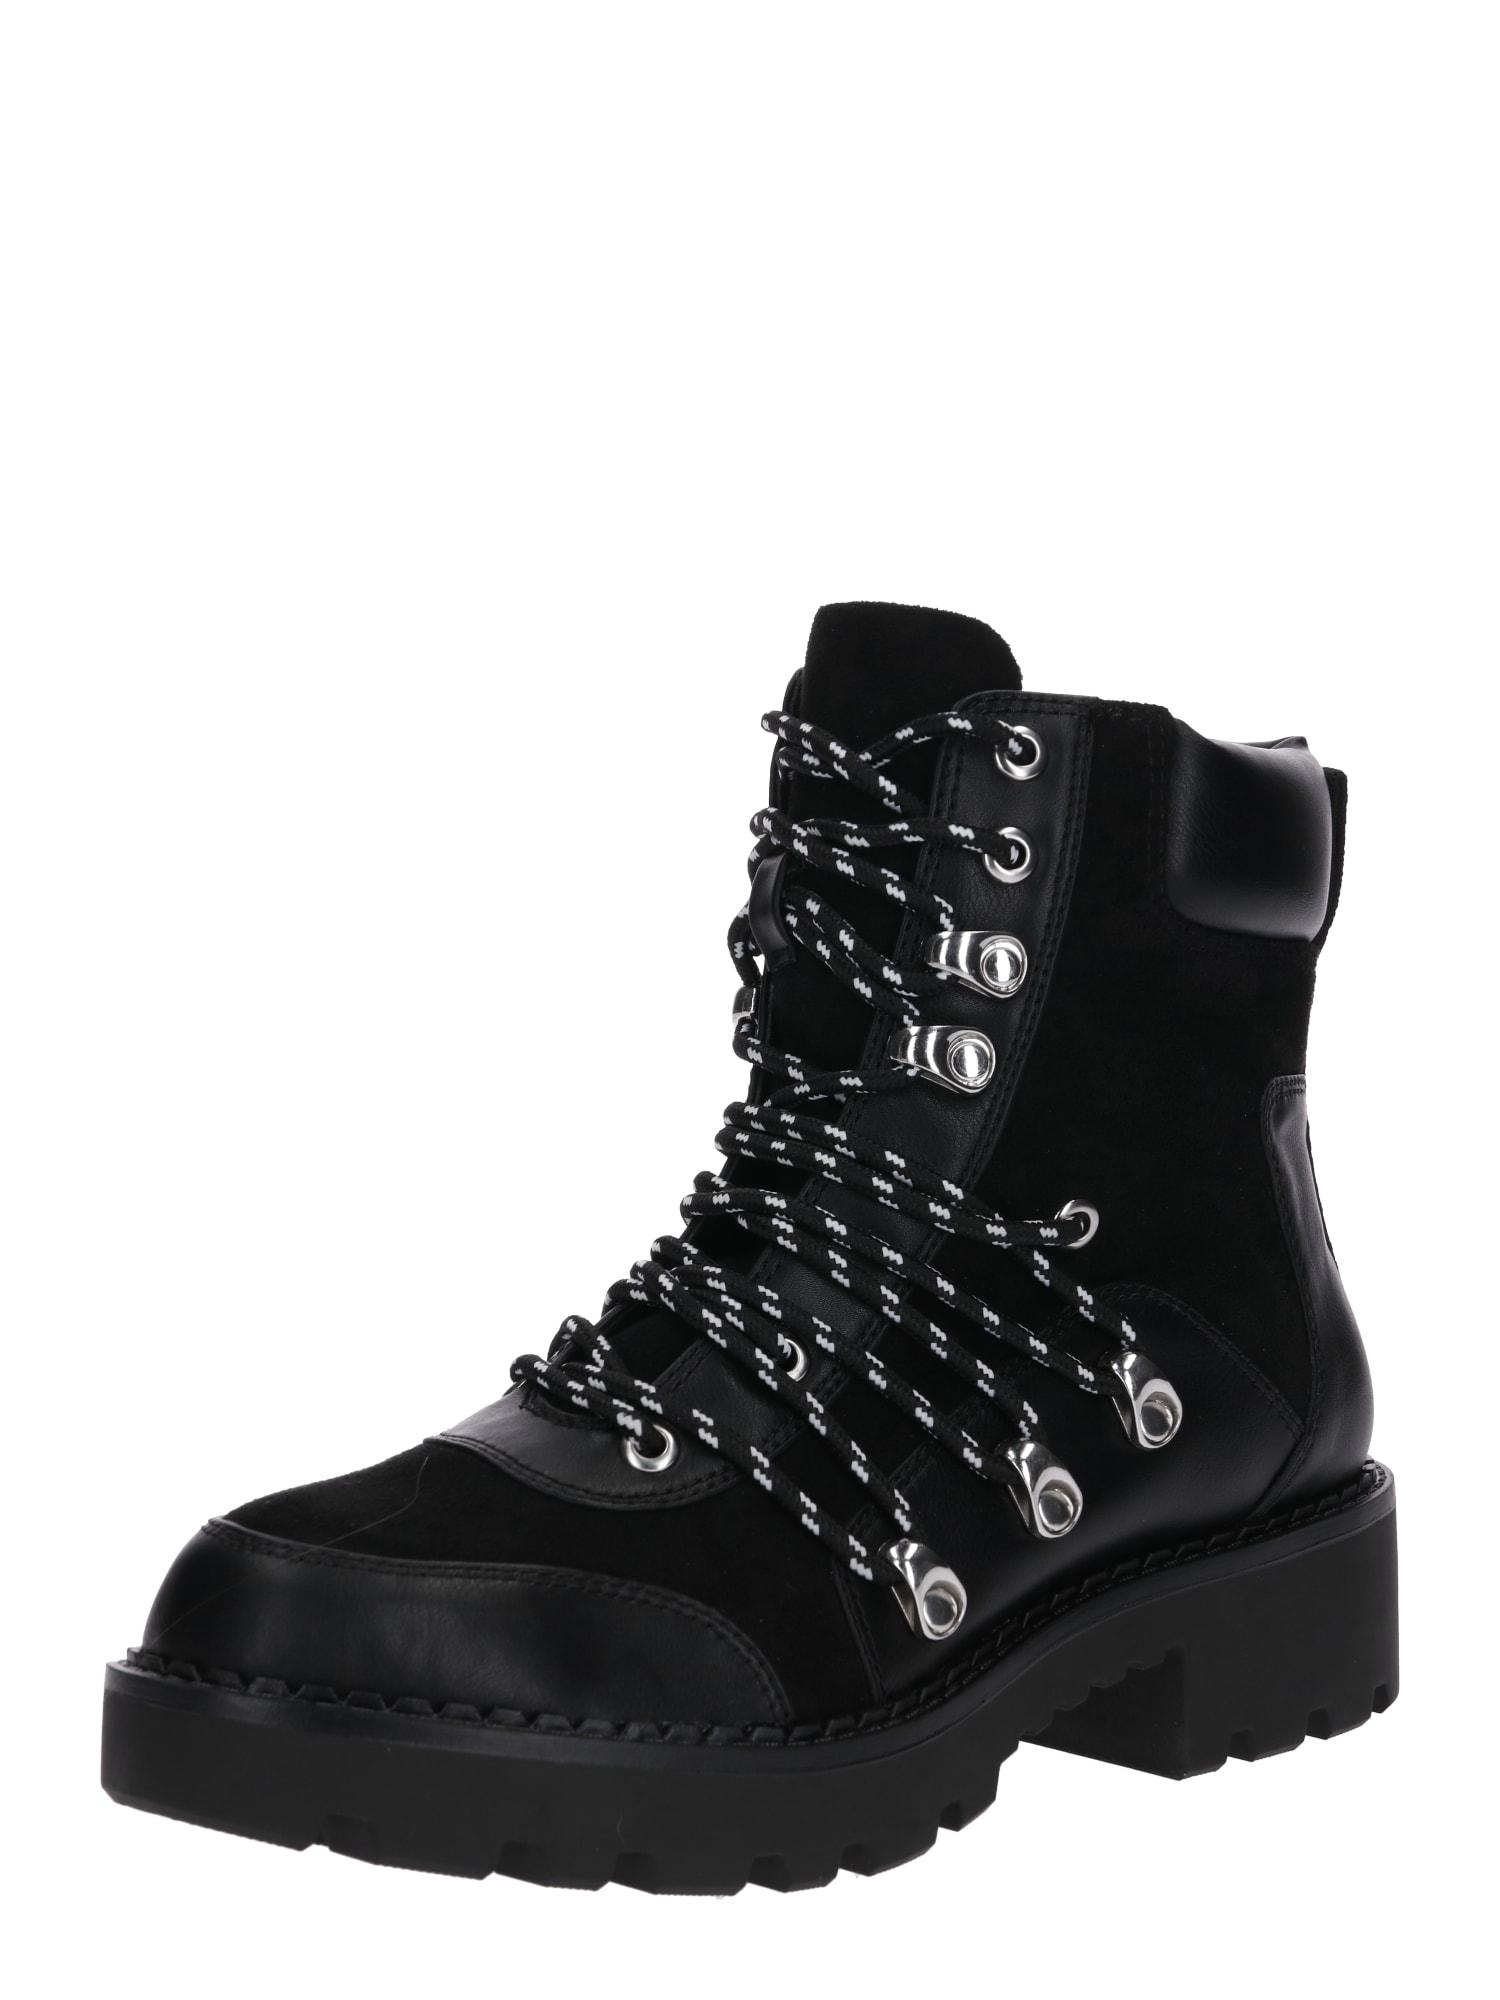 BUFFALO Auliniai batai 'FALI' juoda